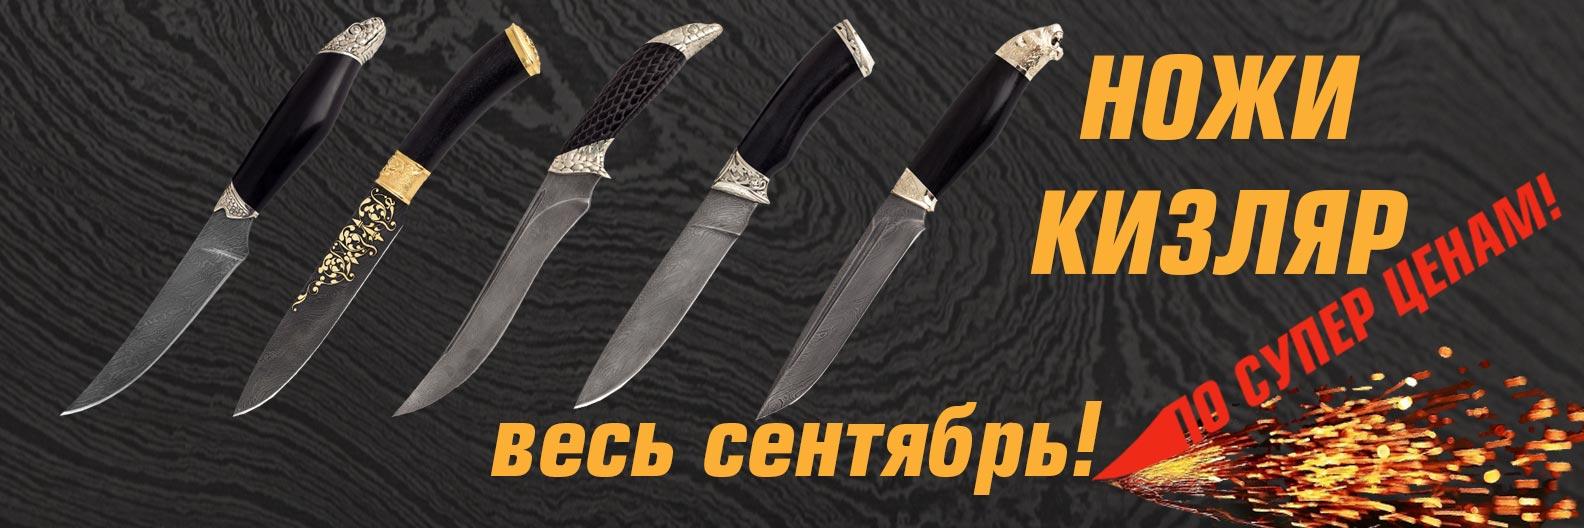 Ножи Кизляр по низким ценам в интернет магазине Yagnob.ru